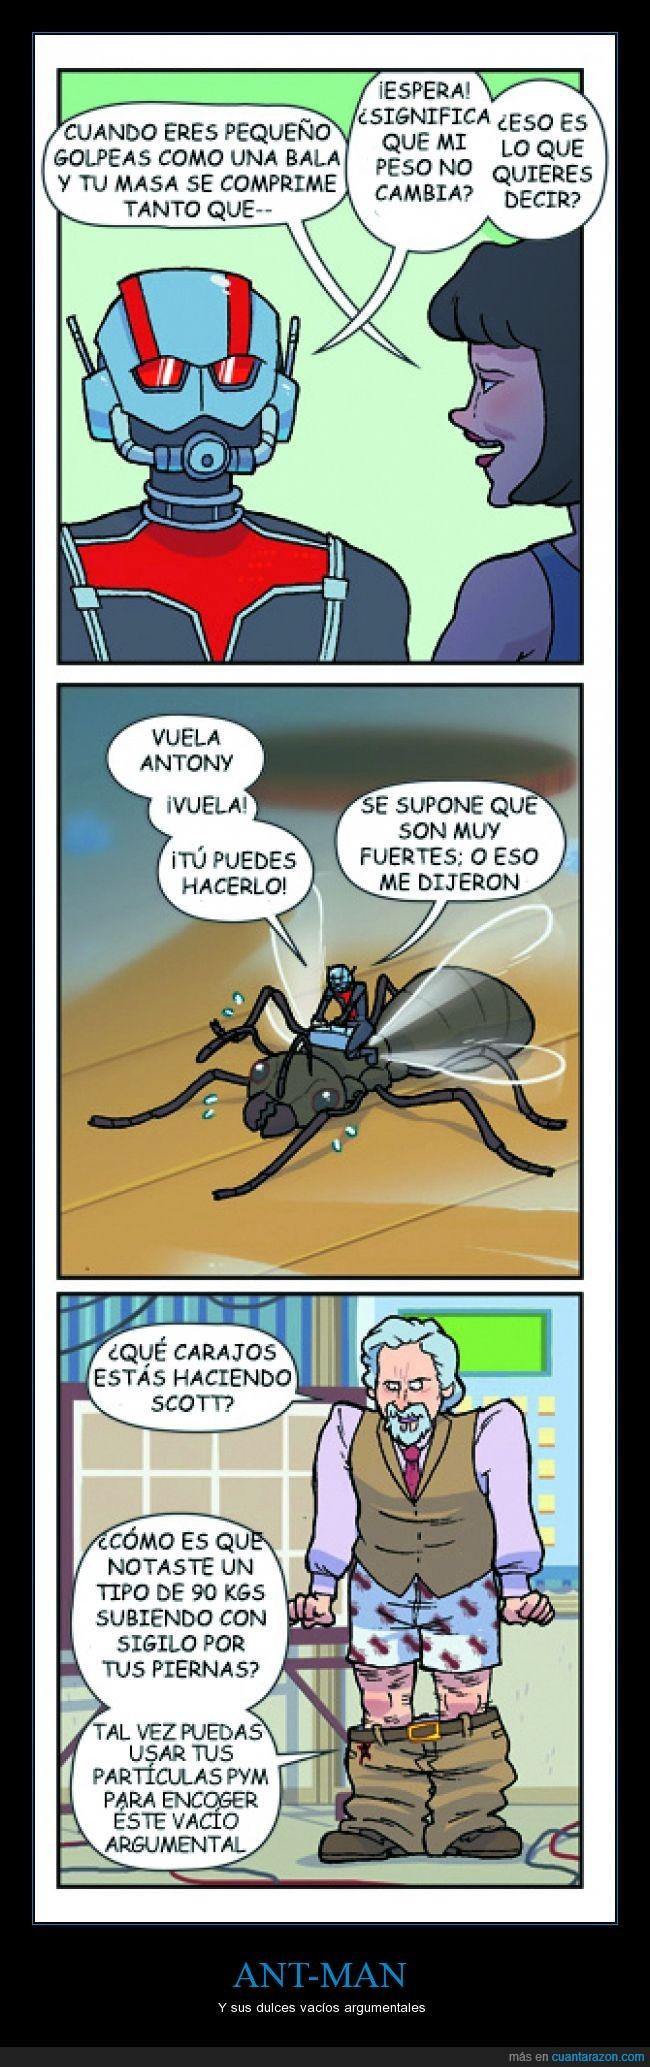 ant man,Ant-man. Marvel,antman,Cientificamente correcto,Que le den a Newton,Scott Lang